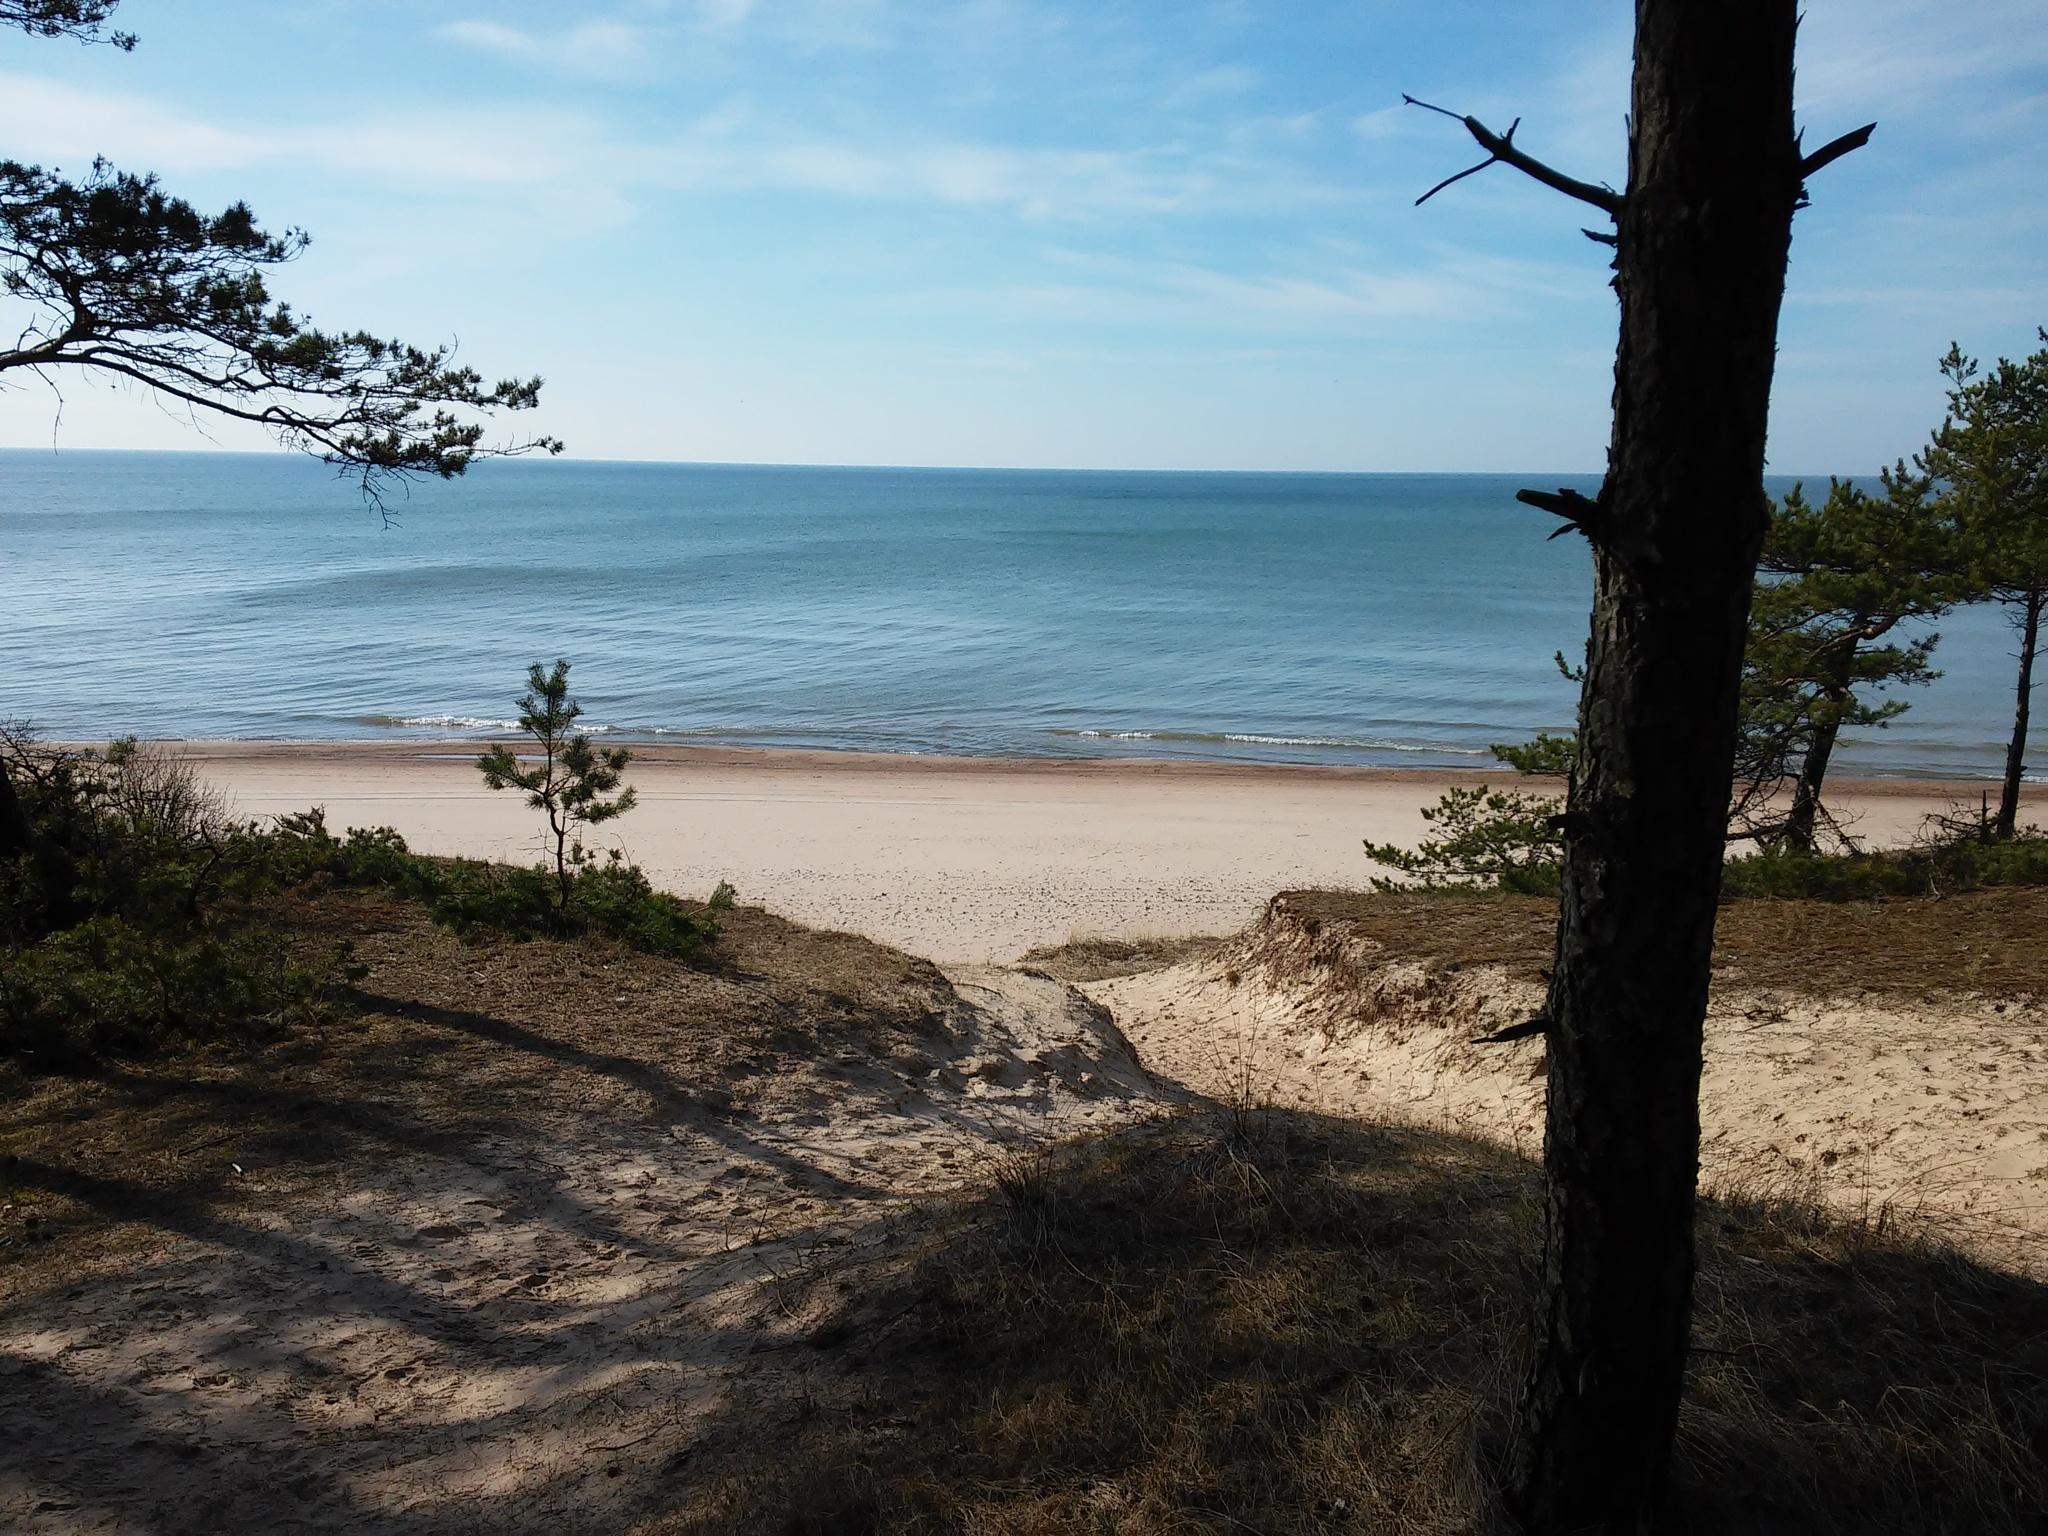 Baltic Sea from Latvia by mach1ne